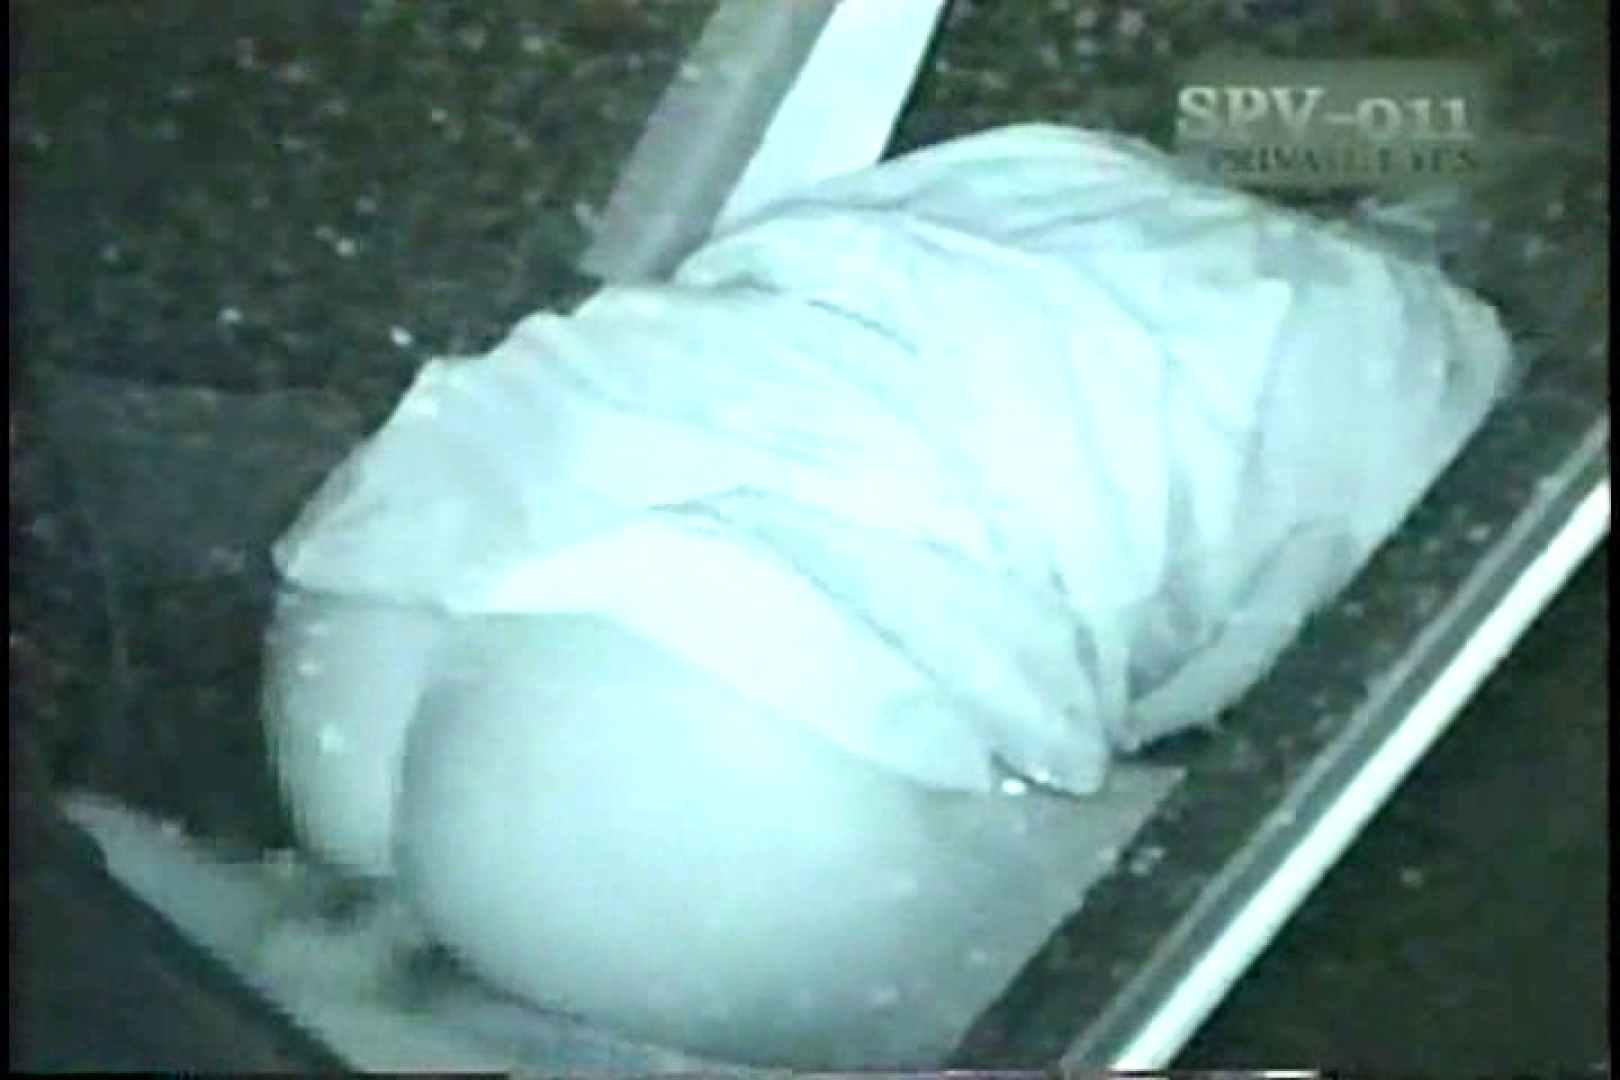 高画質版!SPD-011 盗撮 カーセックス黙示録 (VHS) セックス | カーセックス  94連発 55